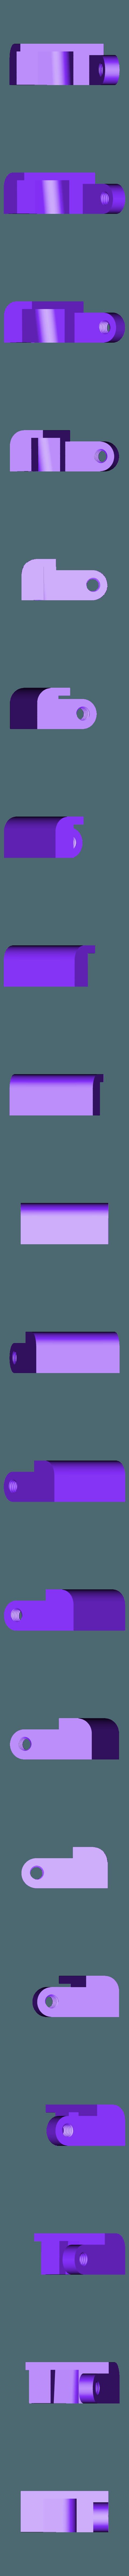 Bucket.stl Download free STL file Marblevator, Mechanisms • Object to 3D print, gzumwalt